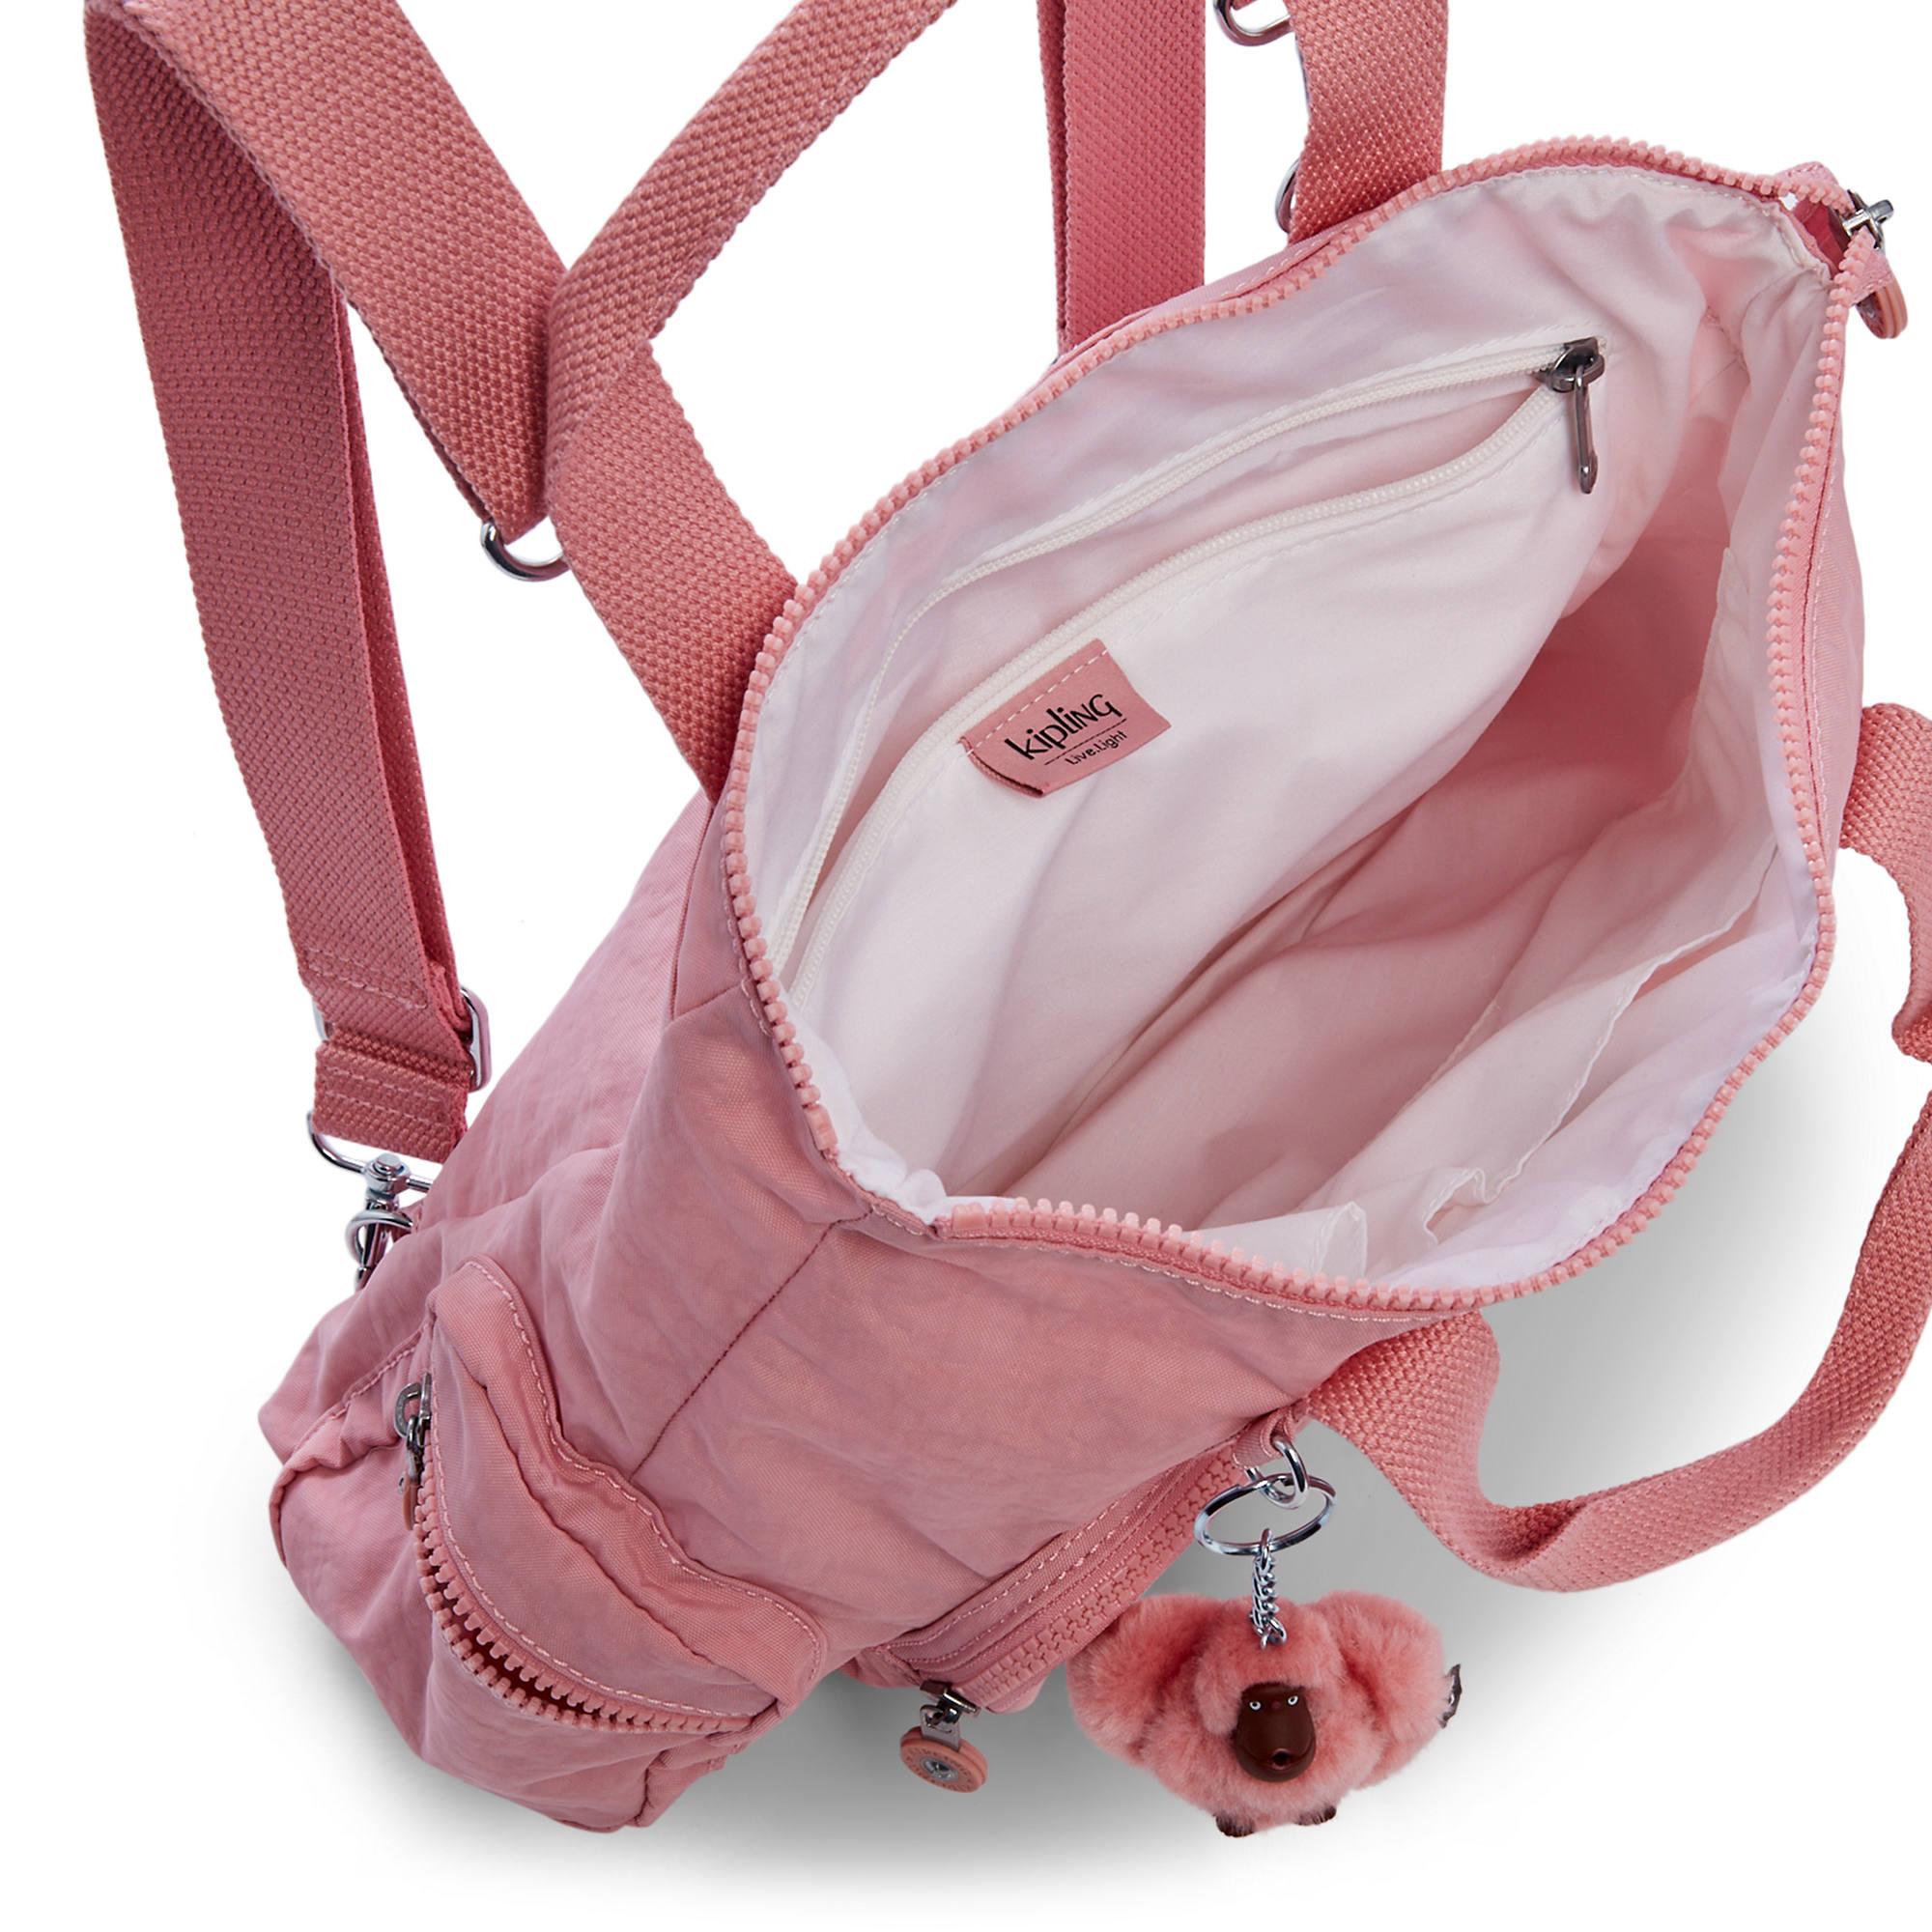 Kipling-Alvy-2-In-1-Convertible-Tote-Bag-Backpack miniatura 39